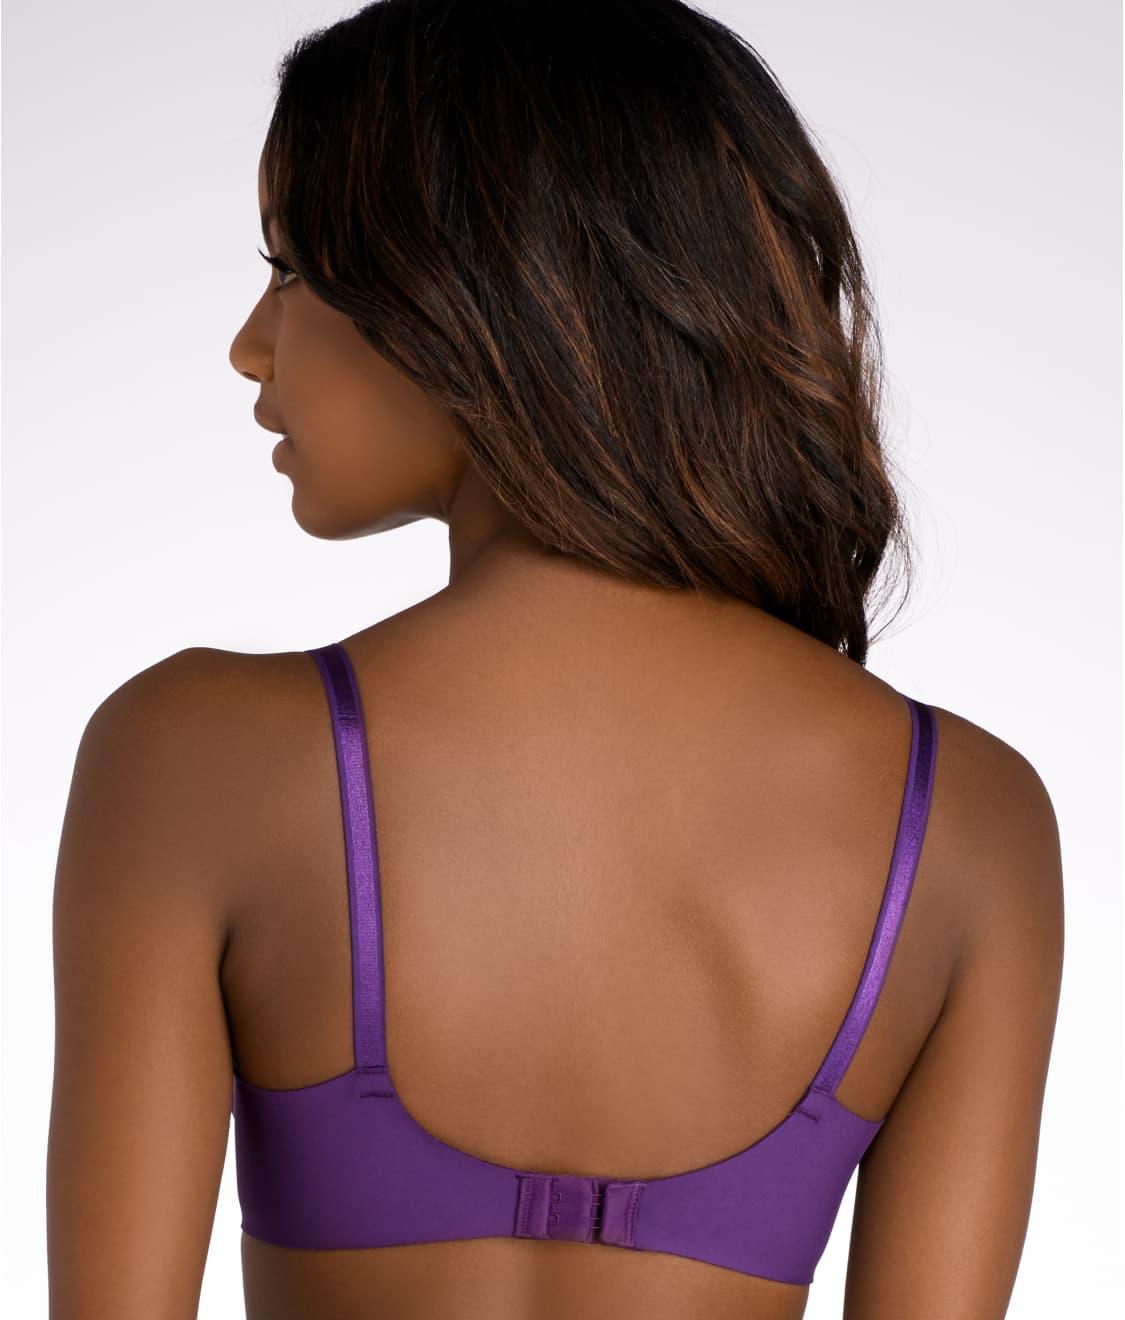 efb14d44da See No Side Effects™ T-Shirt Bra in Purple Pennant